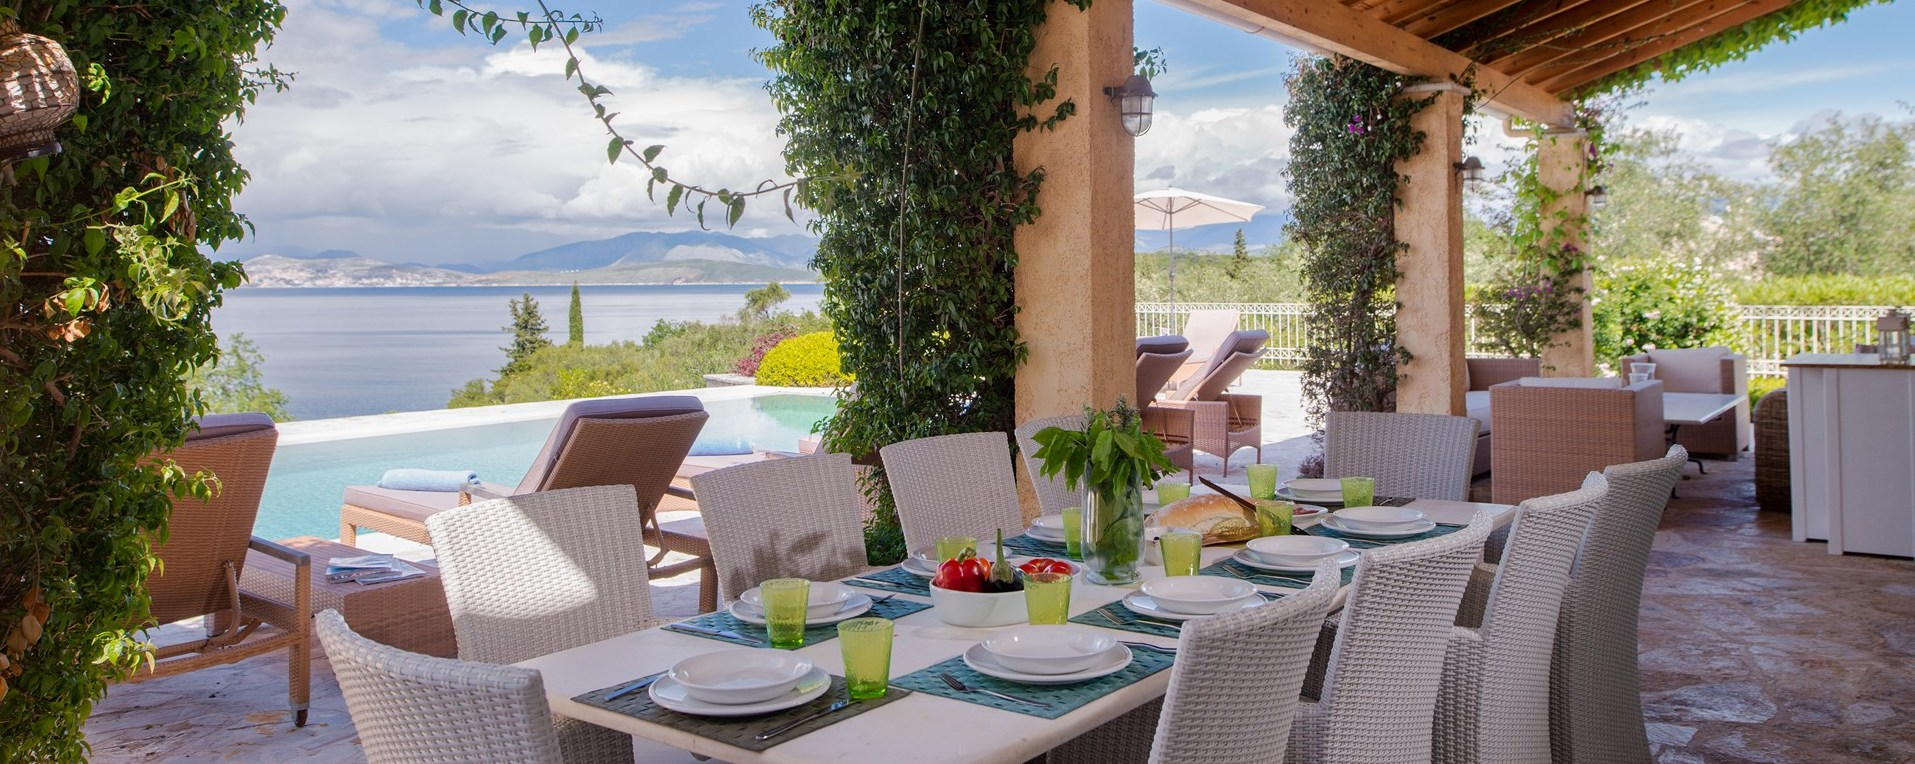 5-bedroom-family-villa-corfu